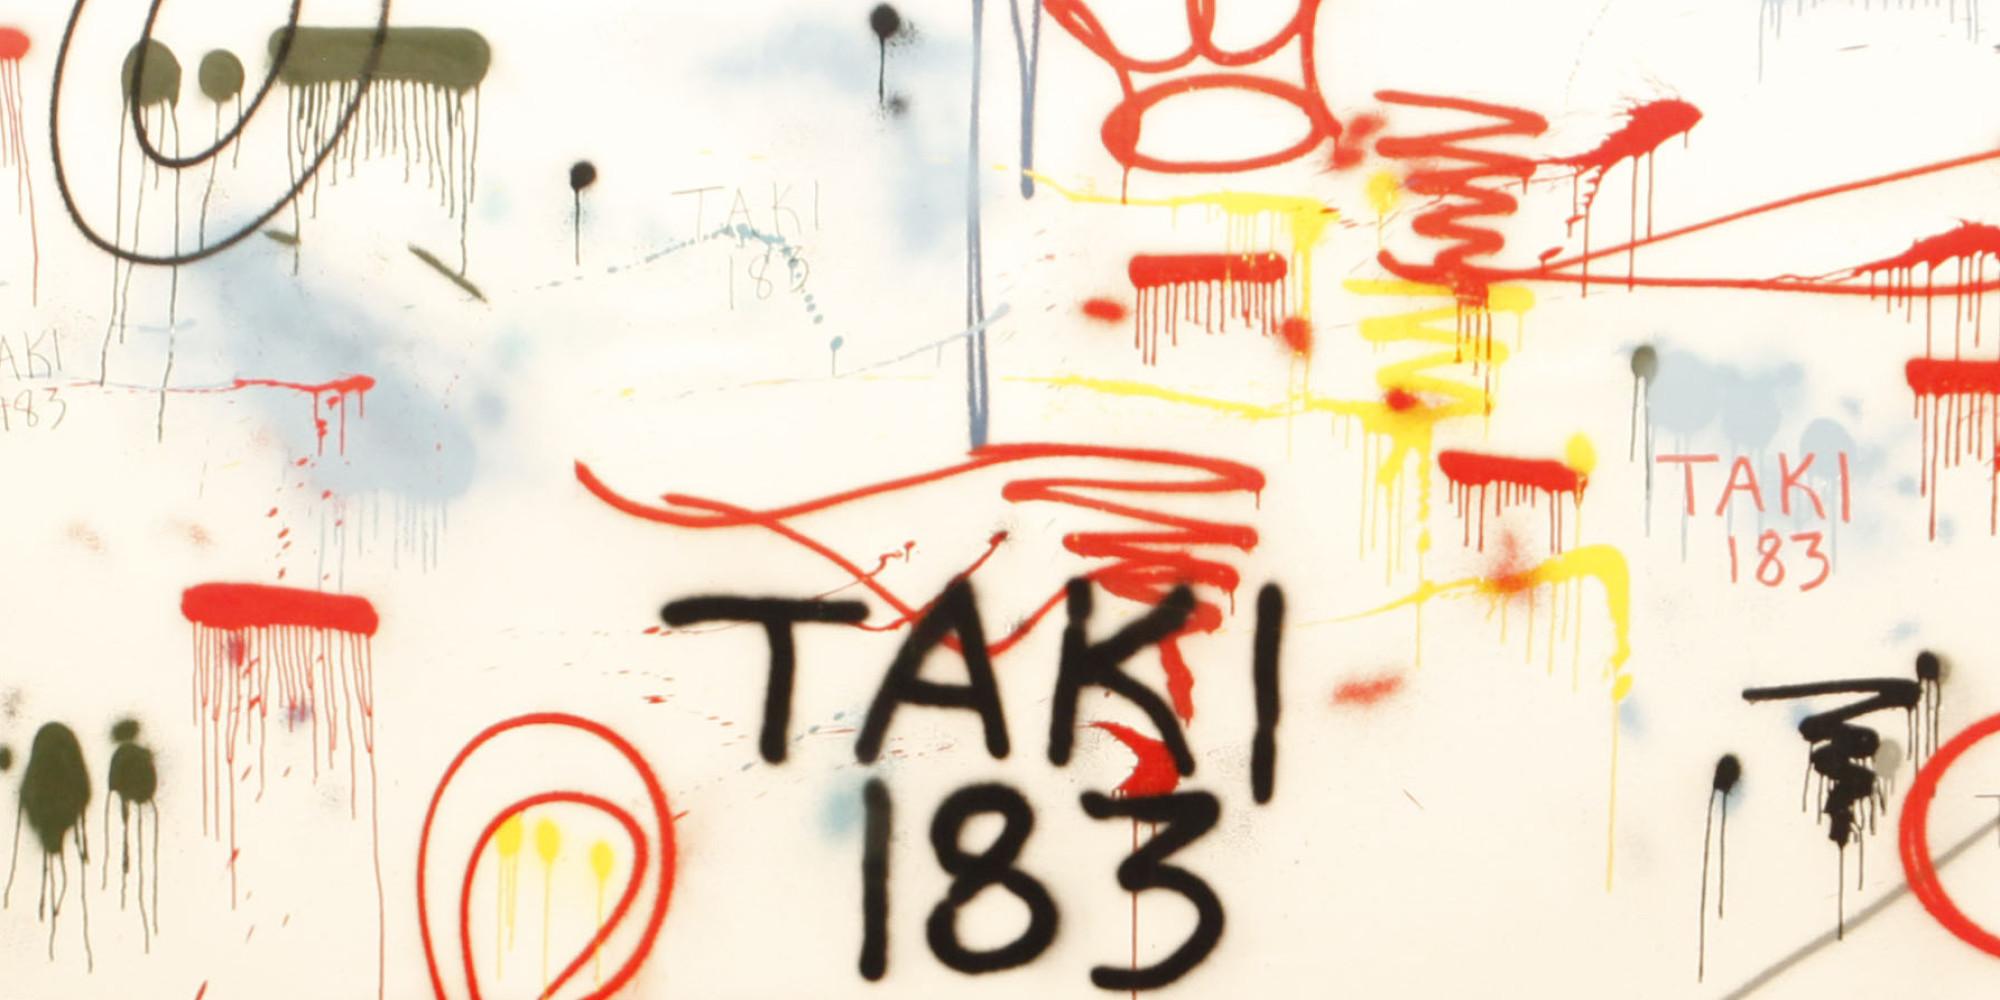 Used Cars Philadelphia >> Graffiti Artist Taki 183 Captivated New York Decades Before Banksy | HuffPost